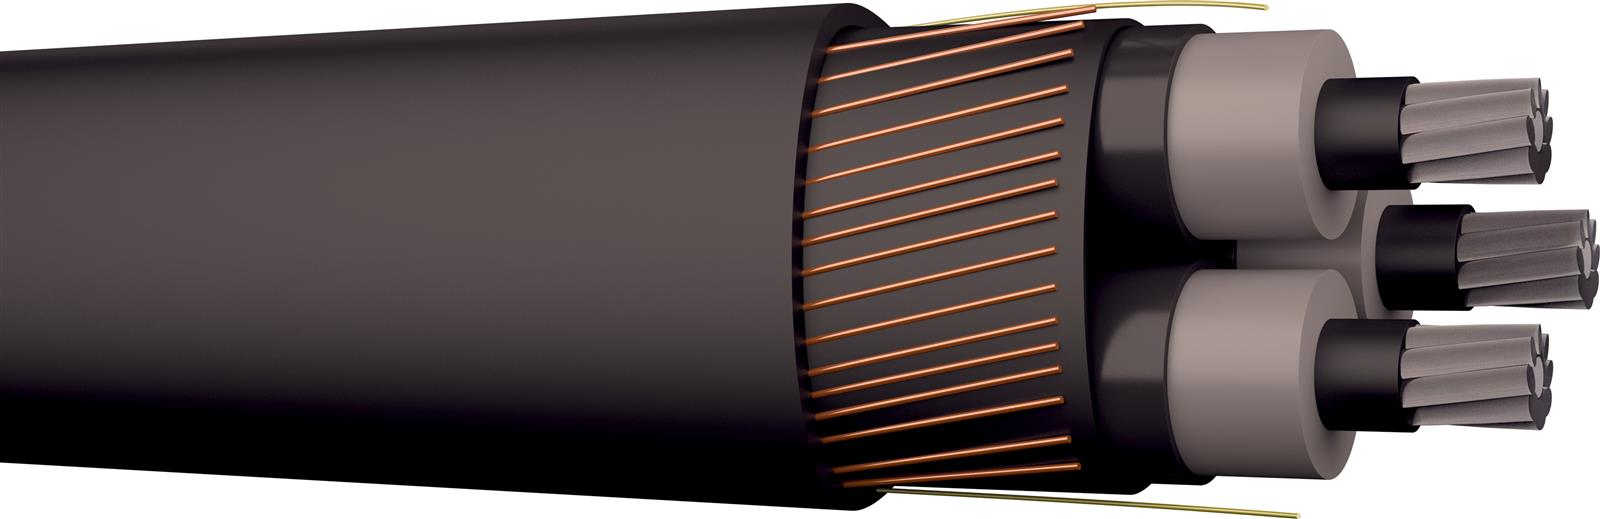 AXLJ-RMF 3X50/16 24KV T500/K20